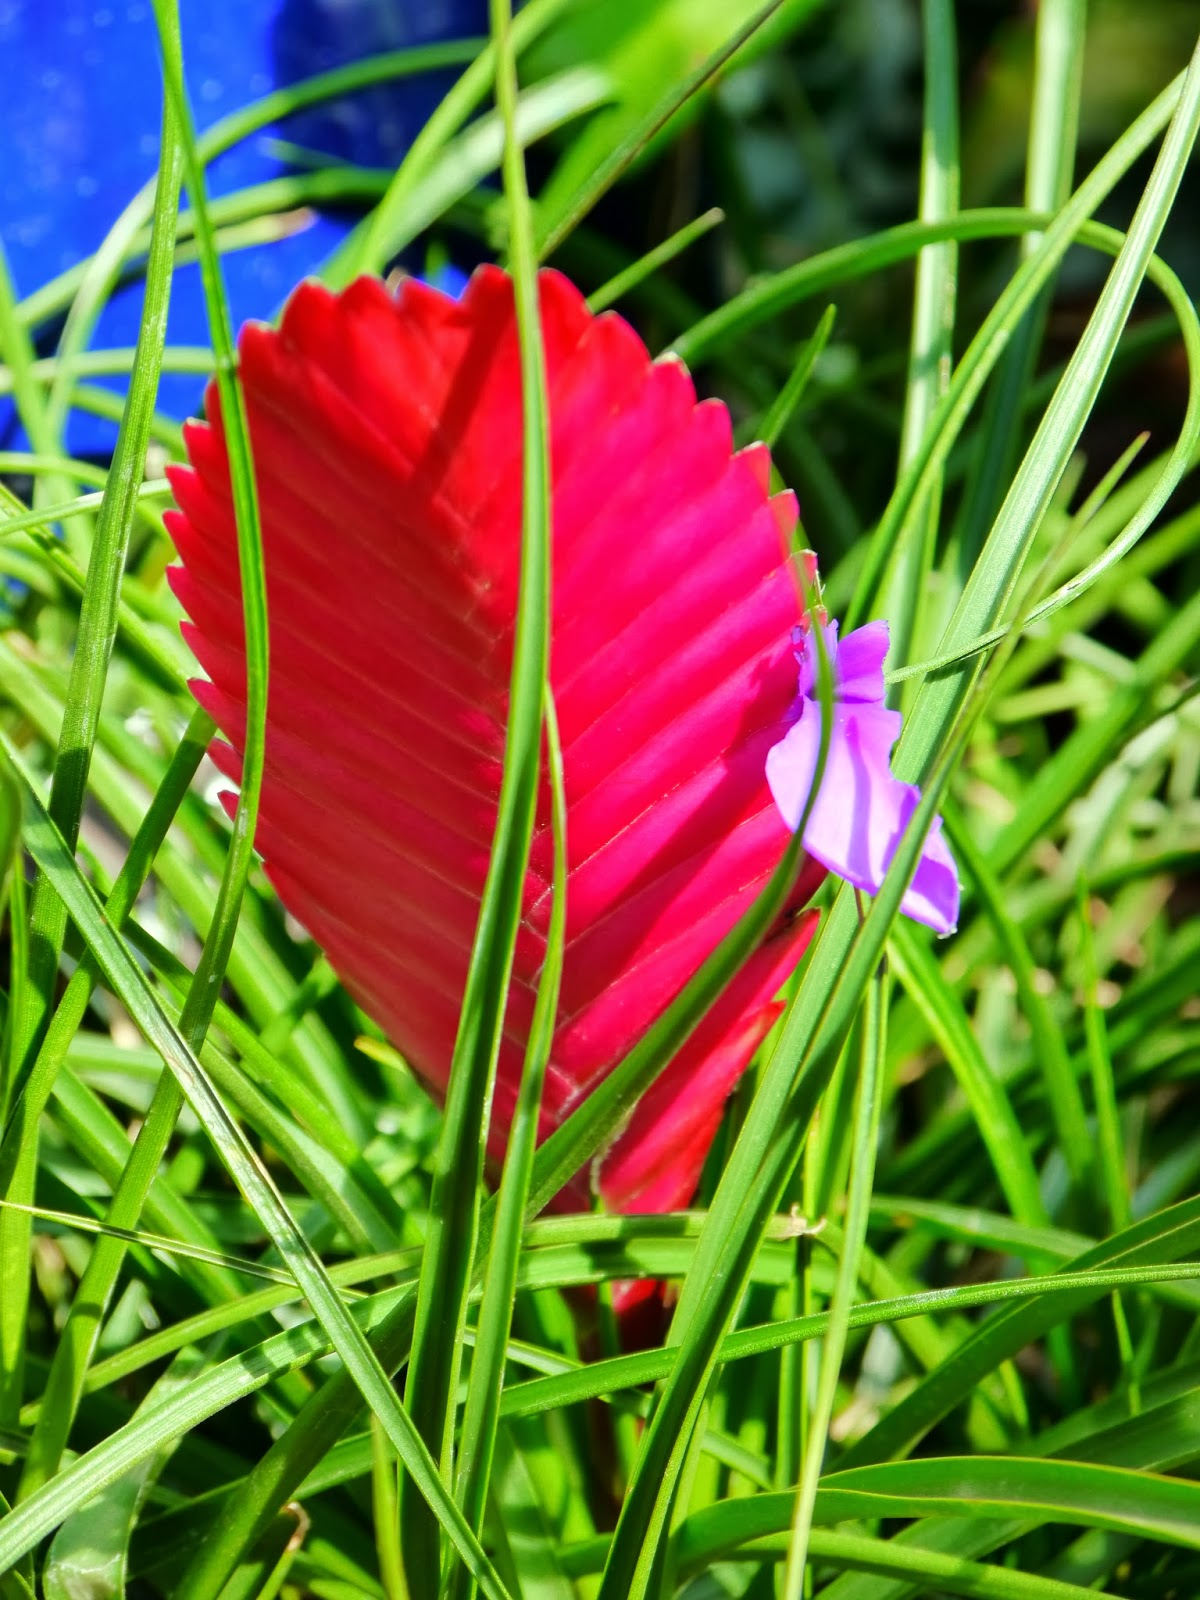 Tillandsia Cyanea Linden Ex K Koch: American Travel Journal: United States Botanic Garden